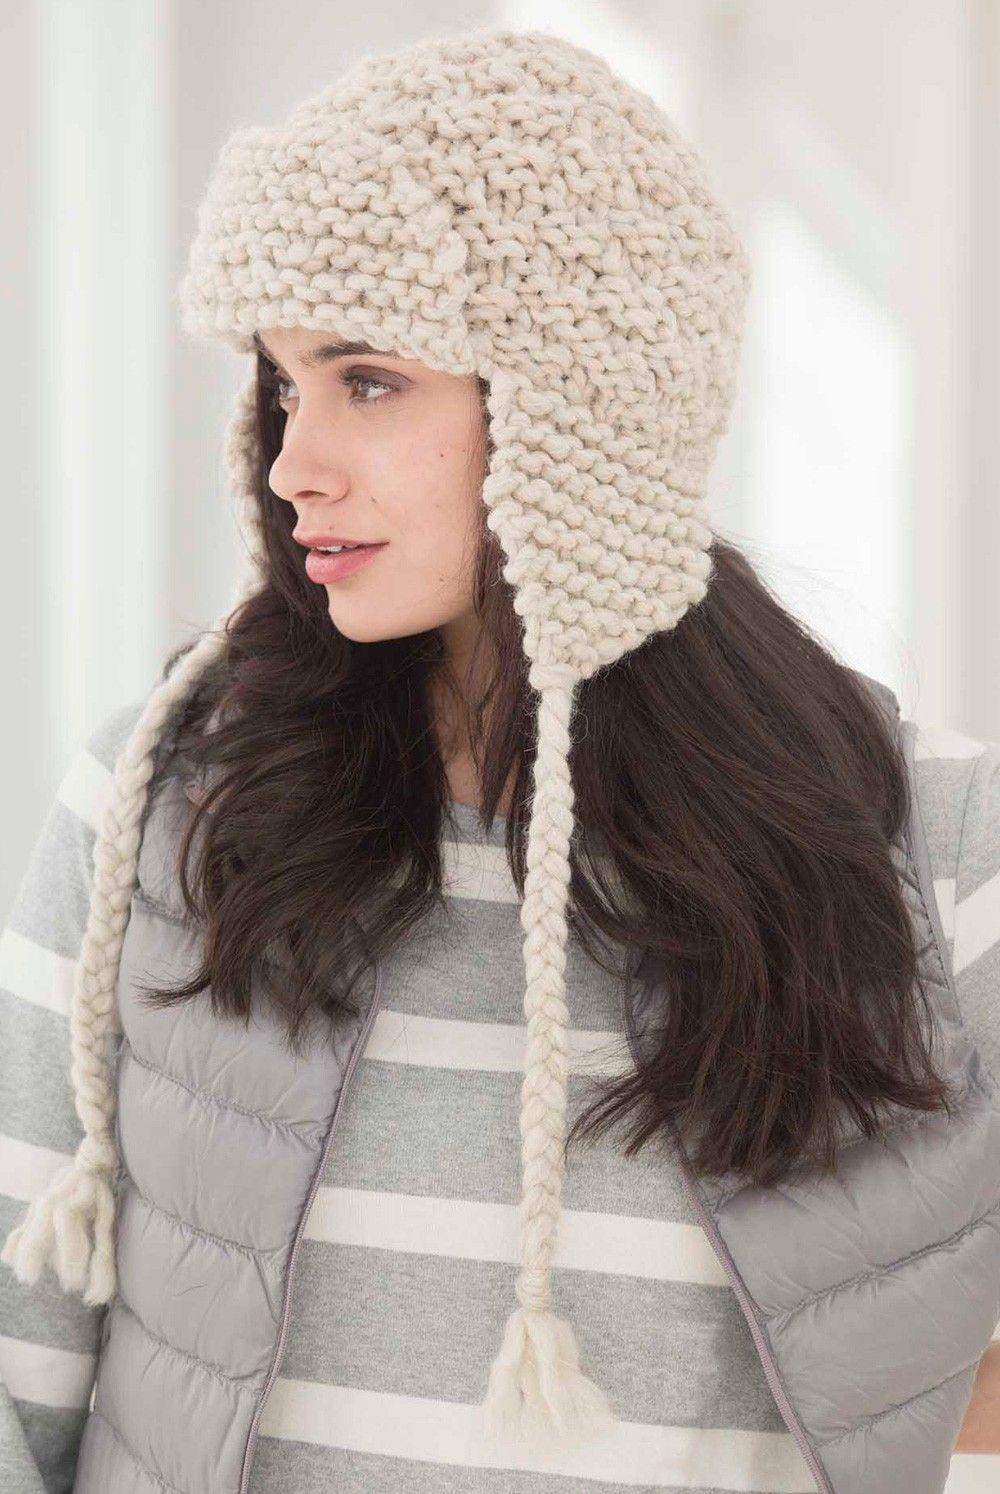 Colorful Loom Knit Earflap Hat Pattern Embellishment - Blanket ...